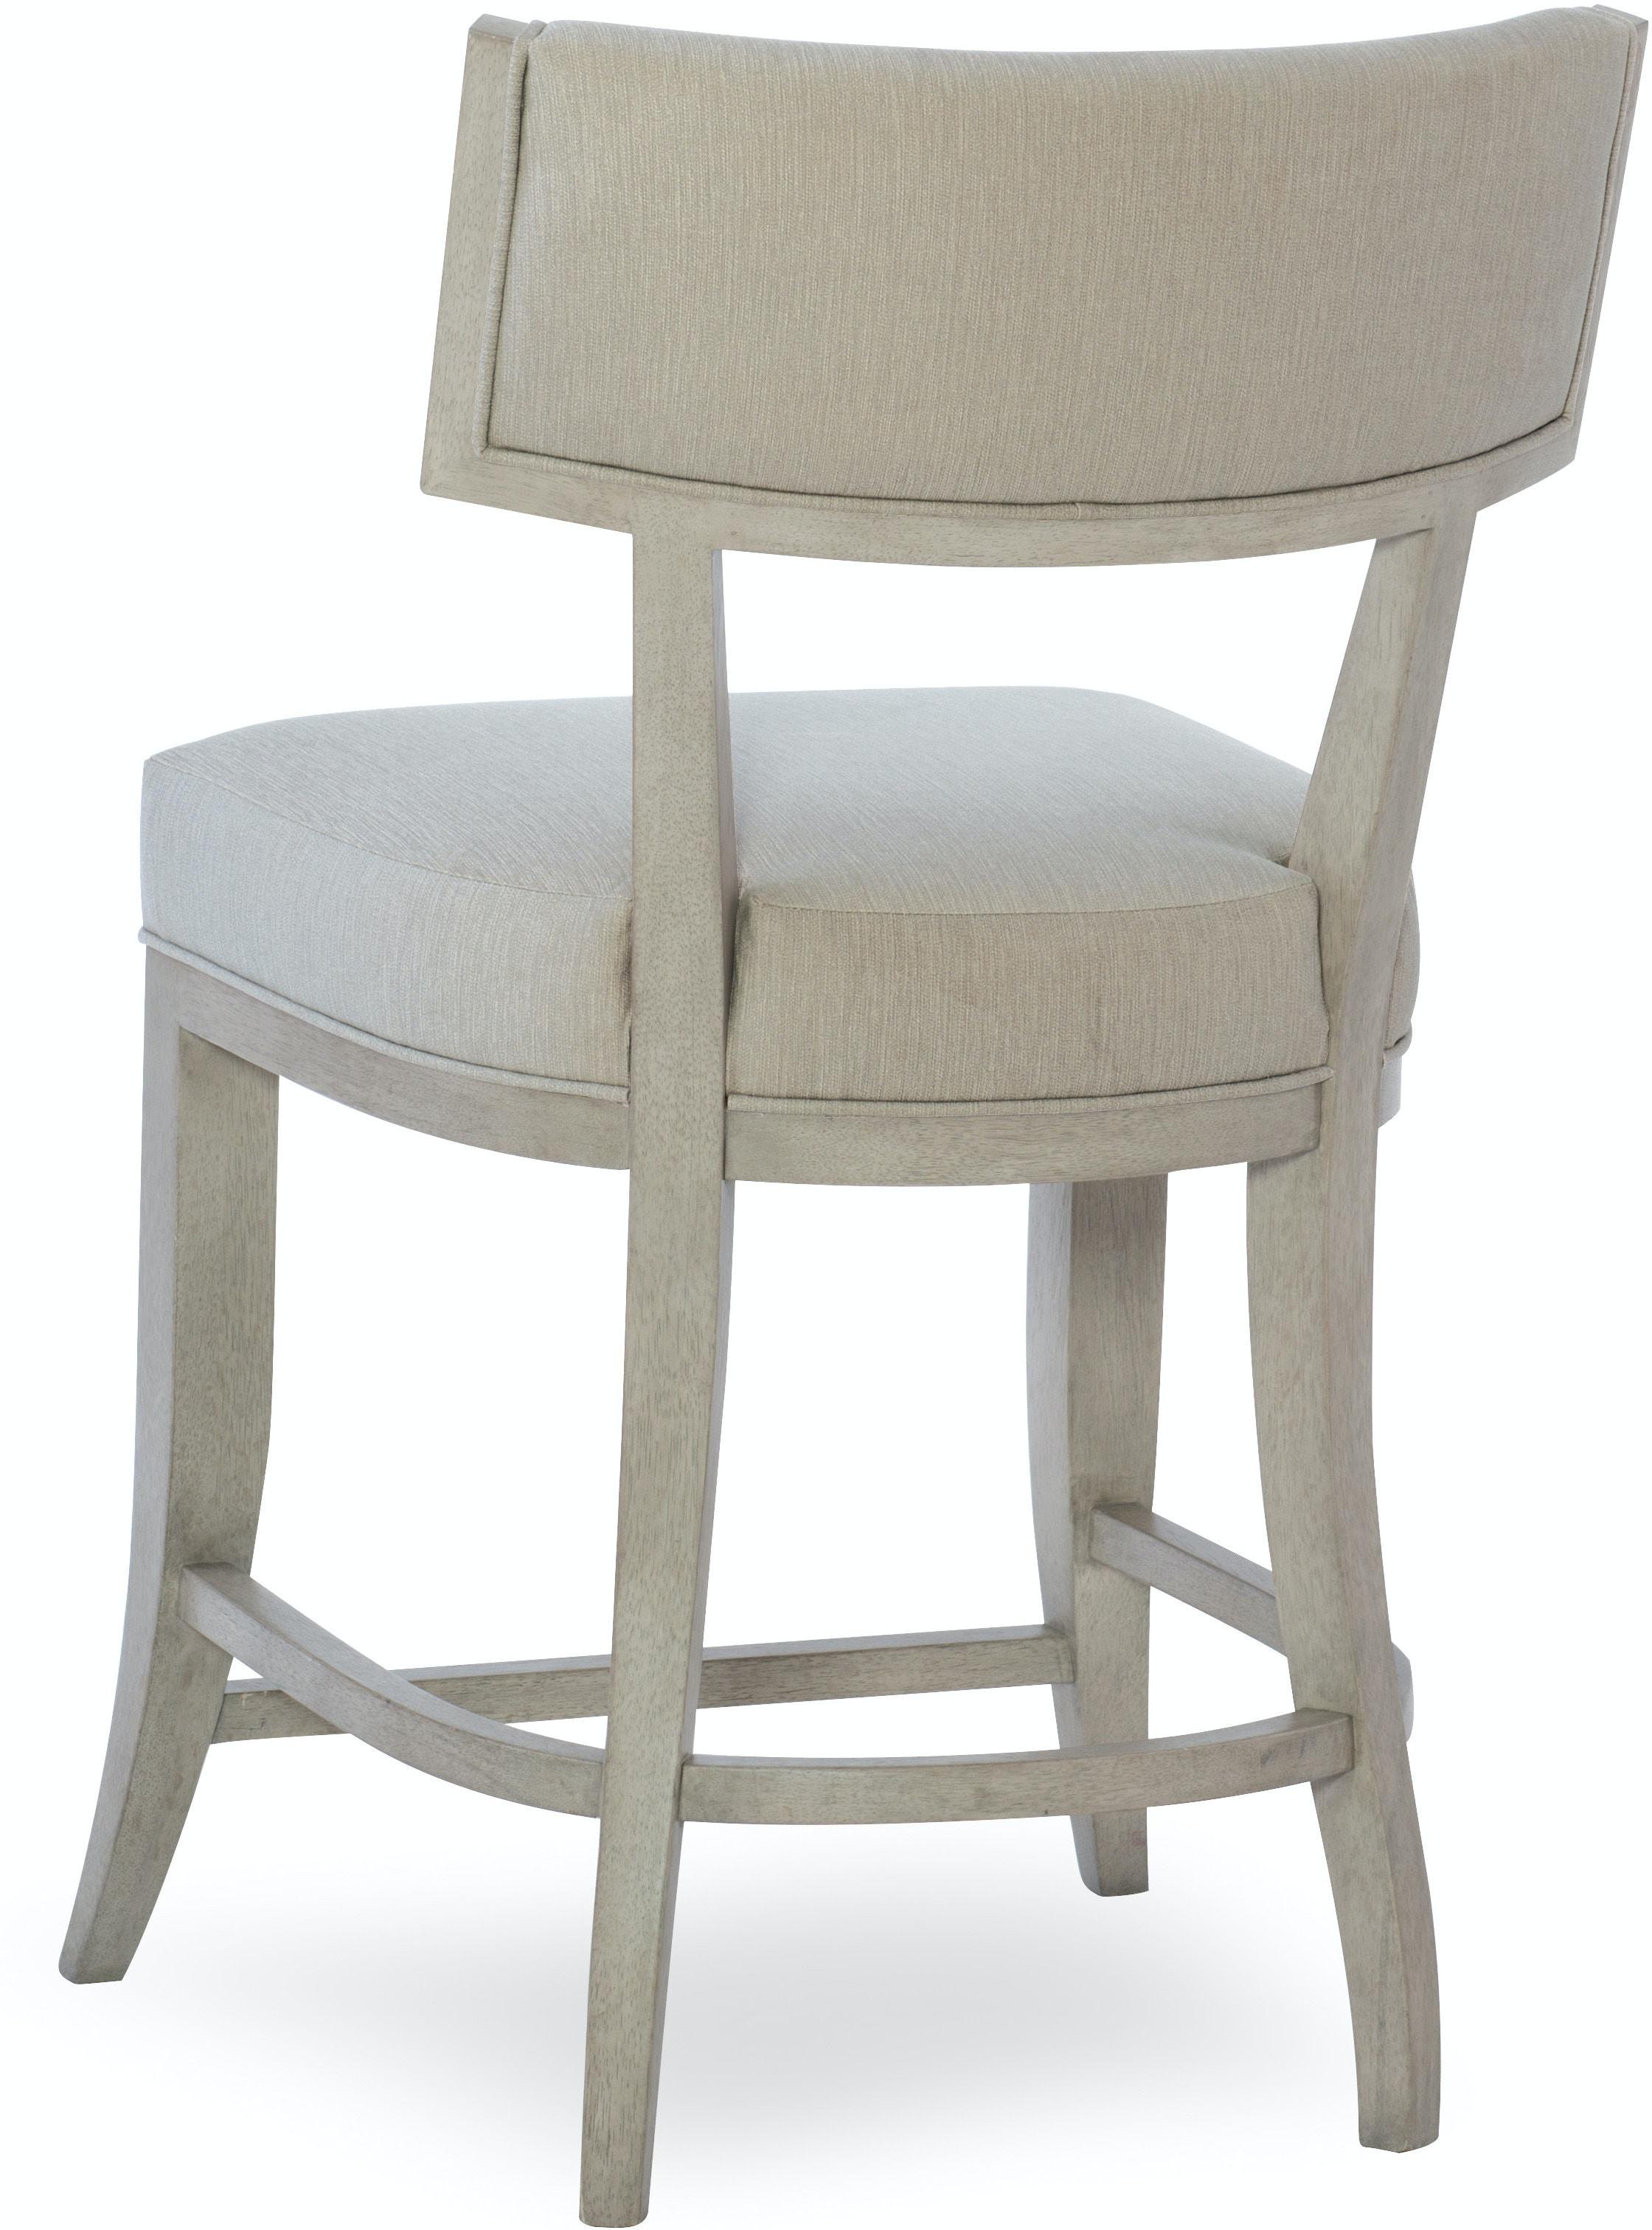 Surprising Hooker Furniture Dining Room Elixir Klismos Counter Stool Inzonedesignstudio Interior Chair Design Inzonedesignstudiocom